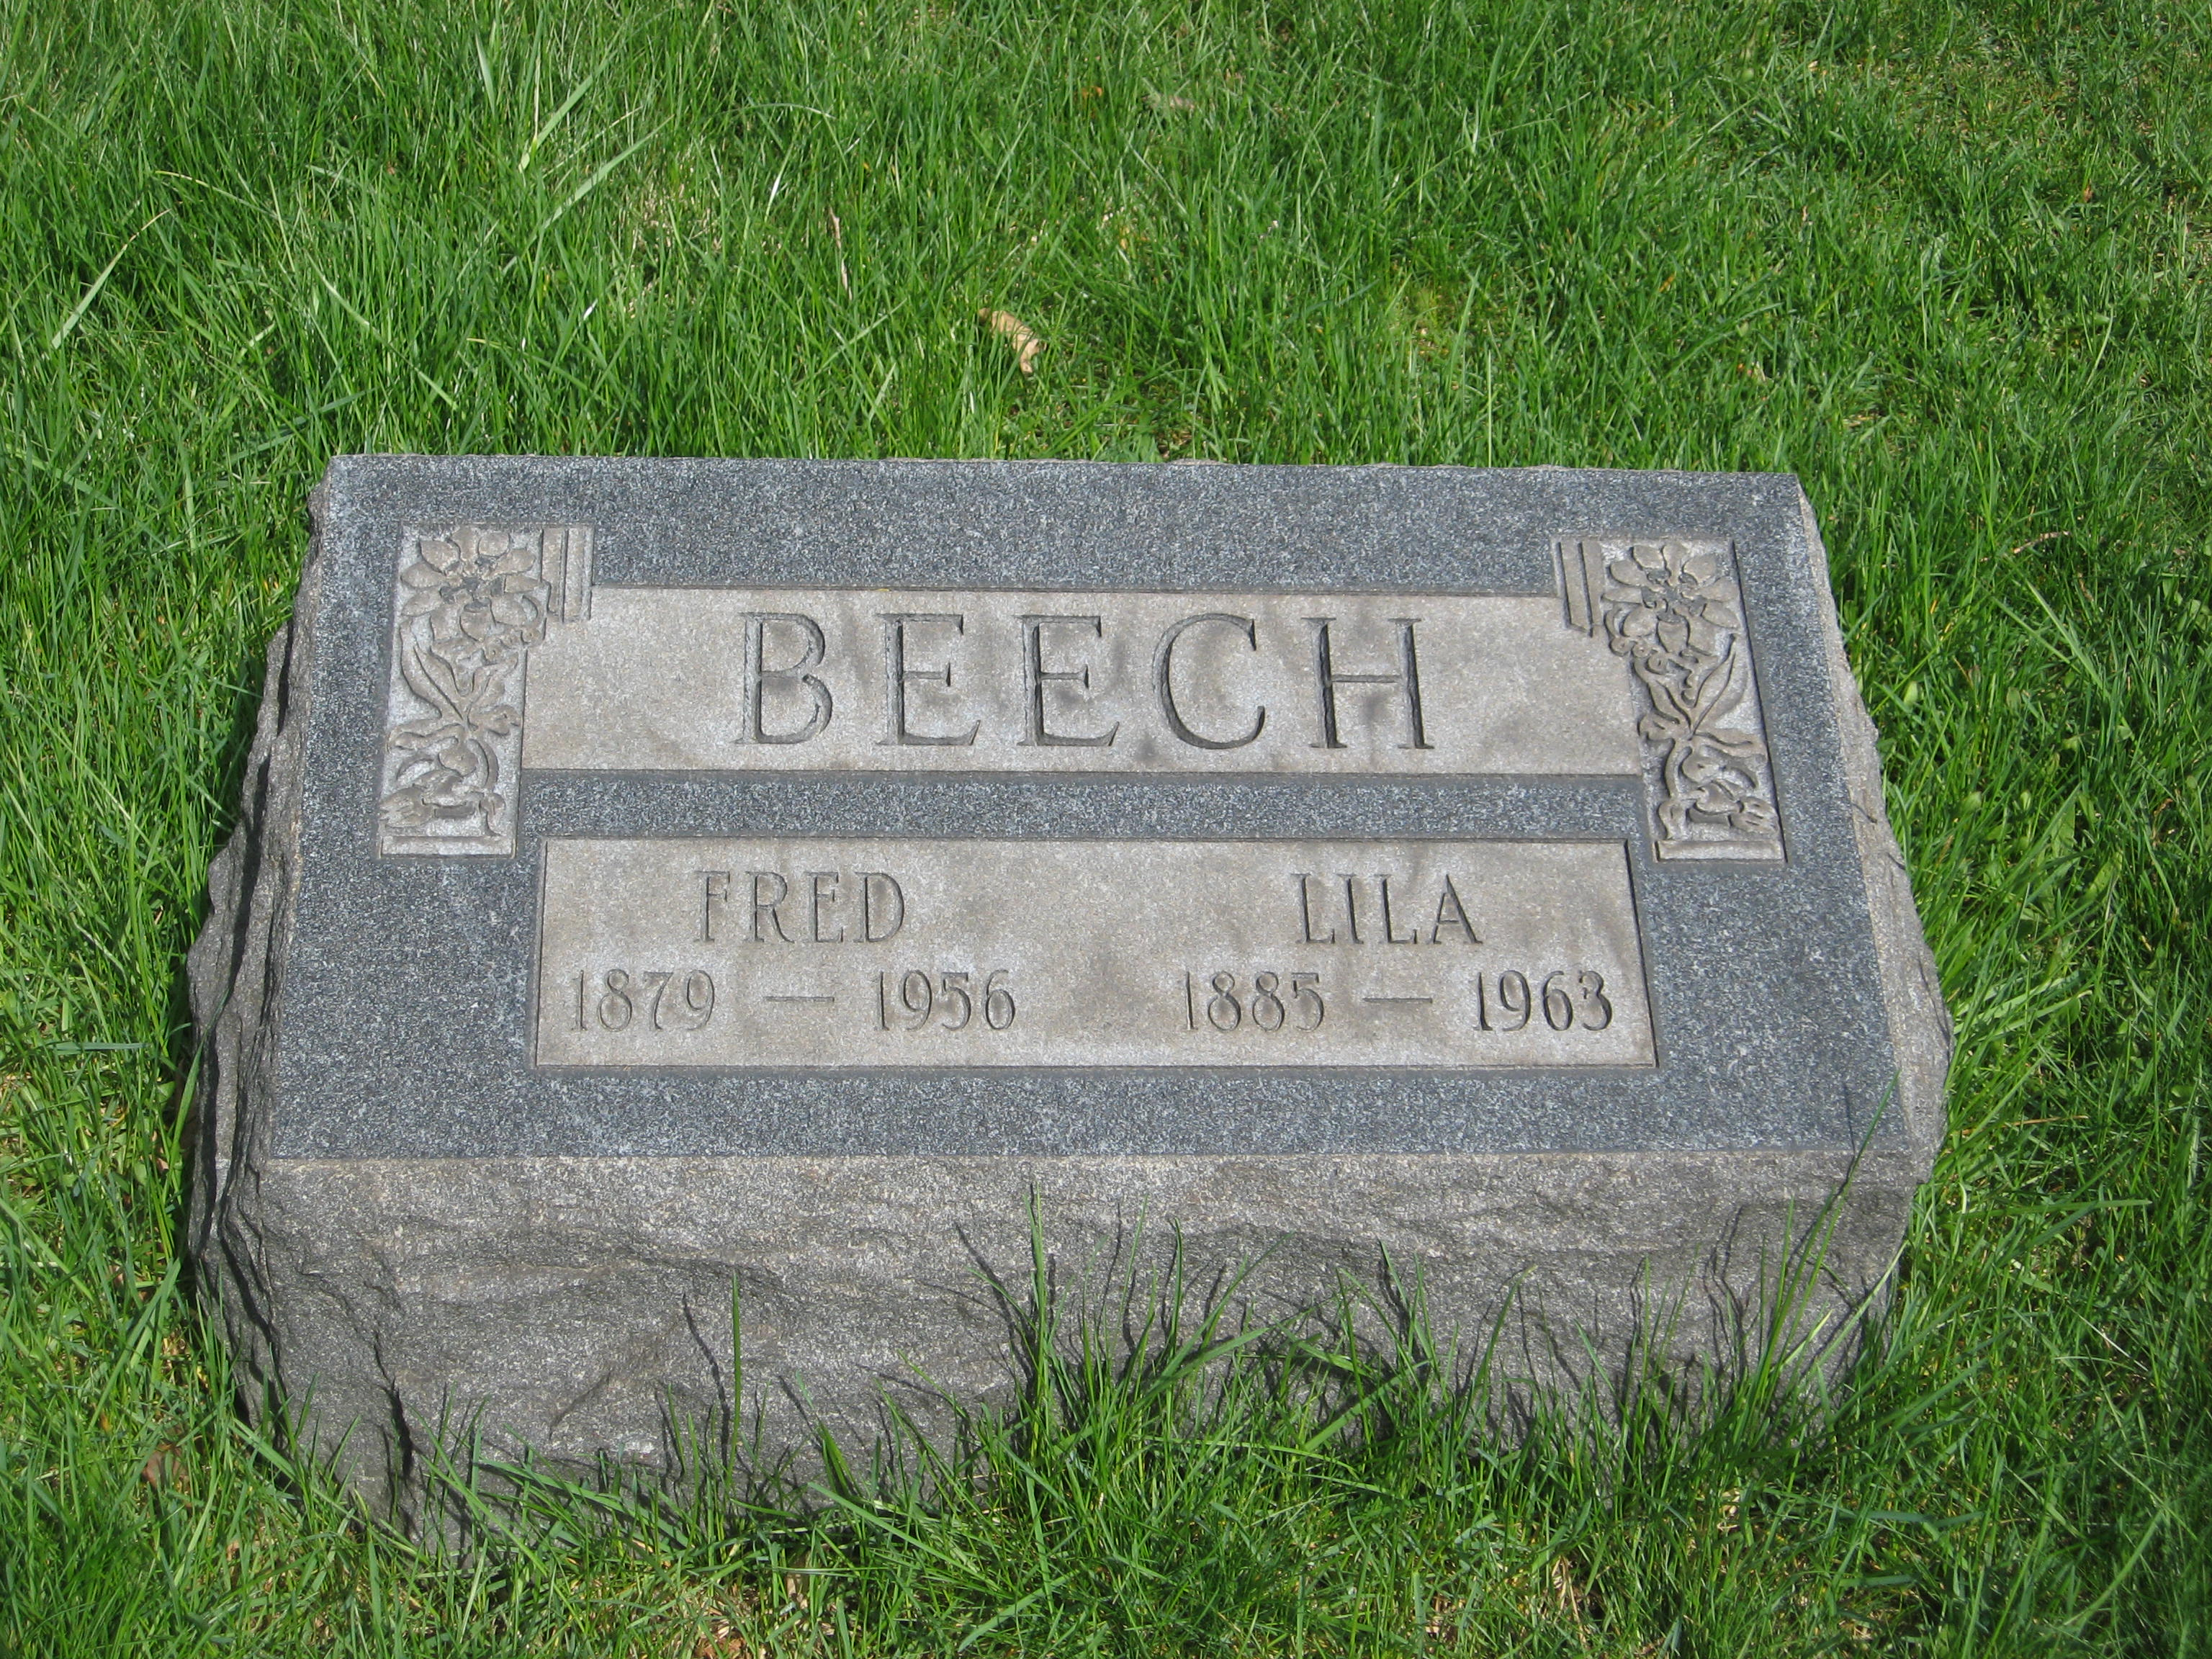 Fred Beech